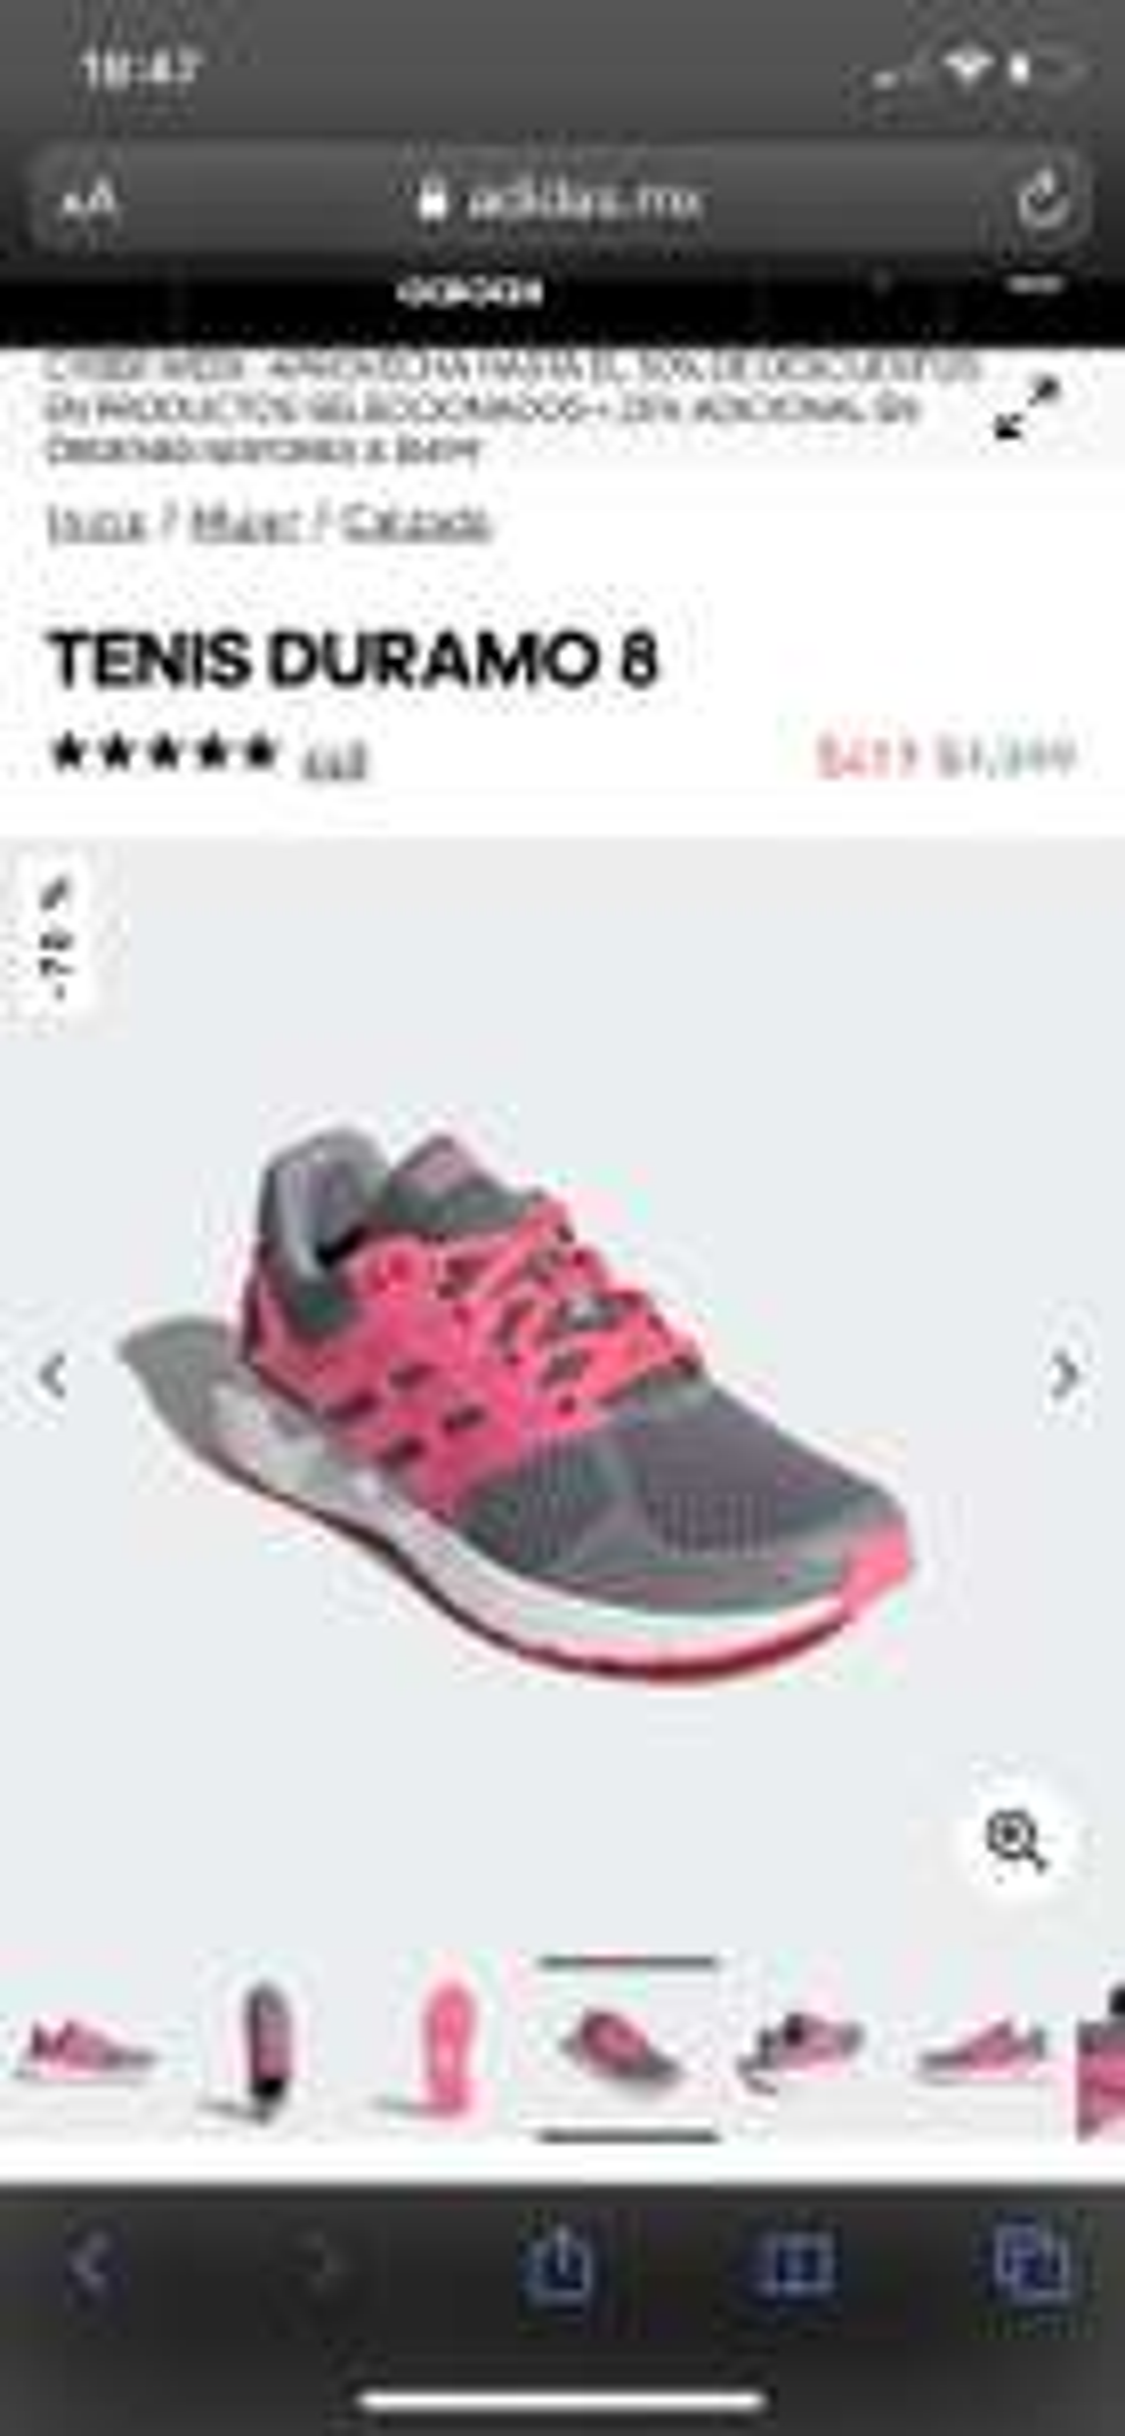 Adidas: Tennis duramo 8 para mujer talla 3